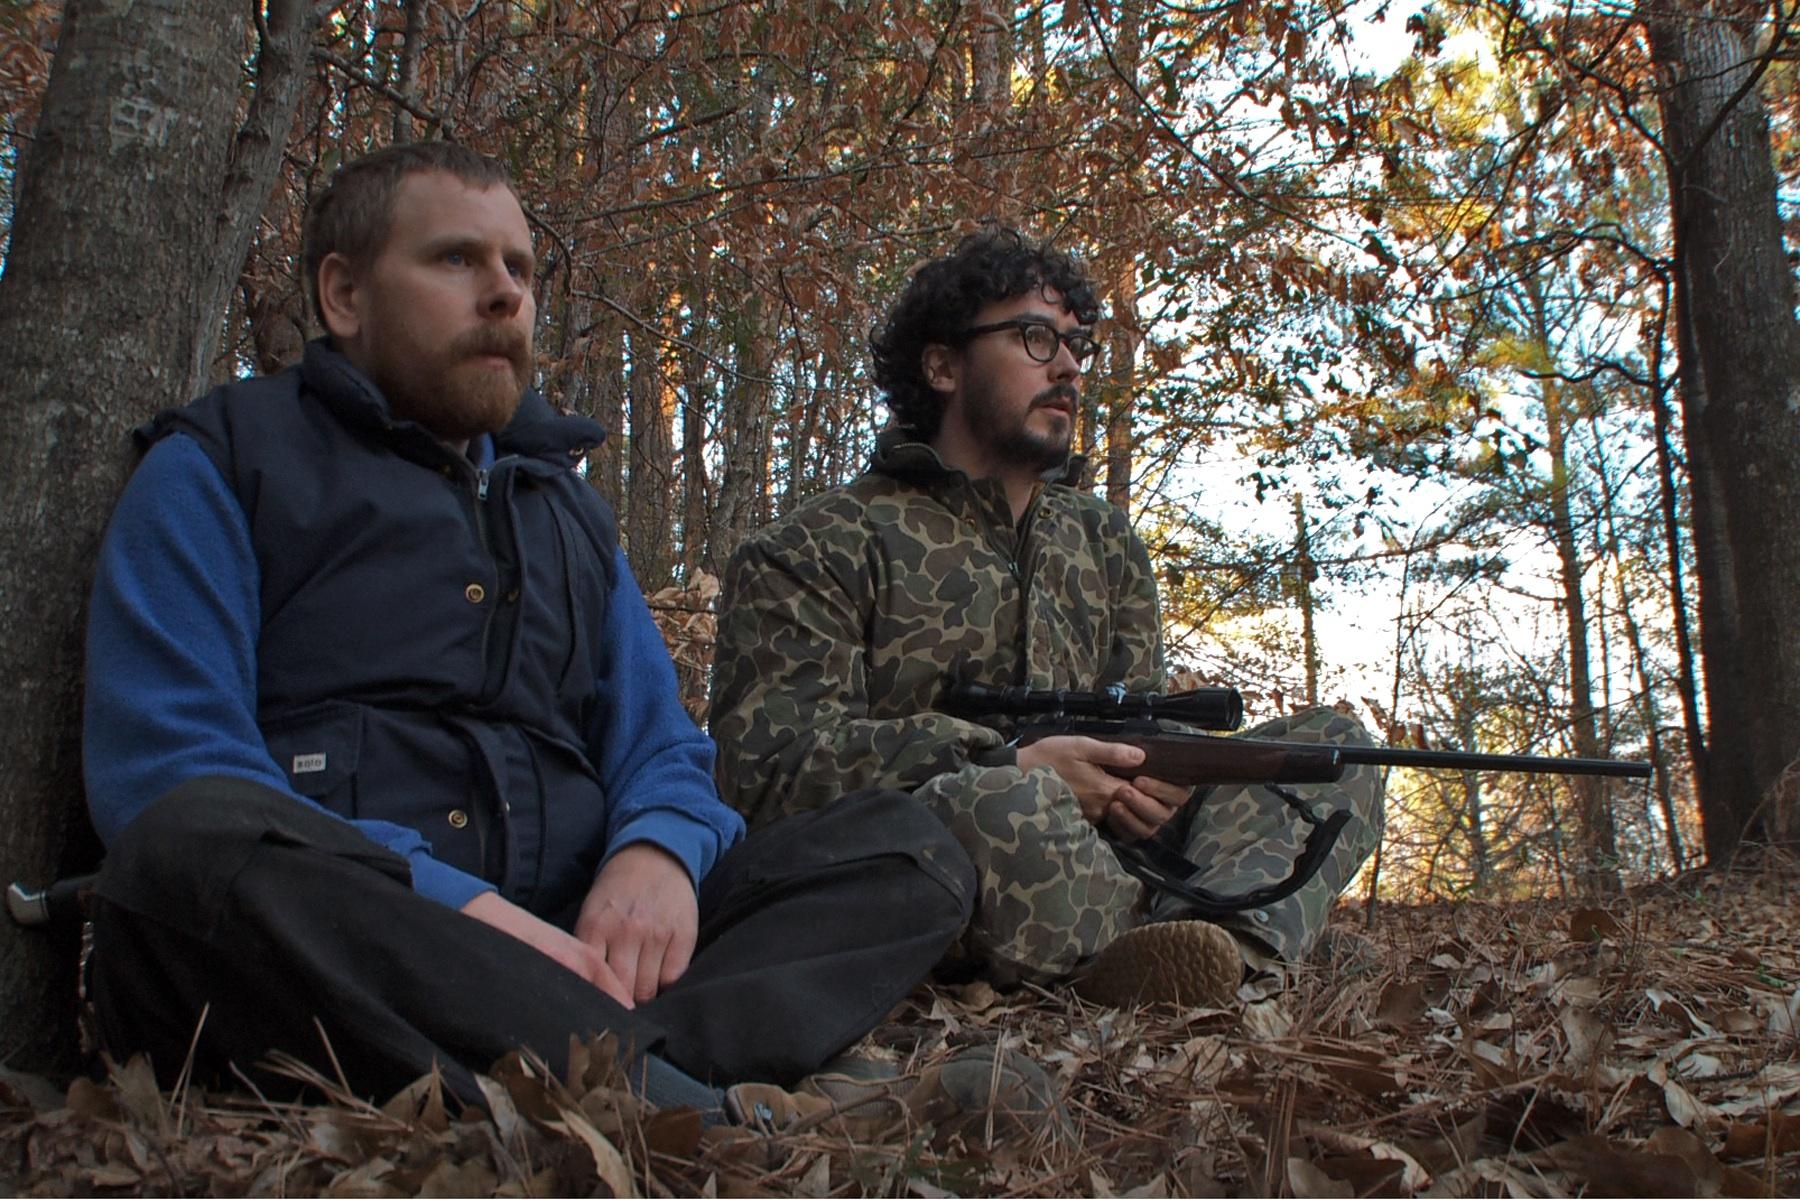 hunting5.jpeg